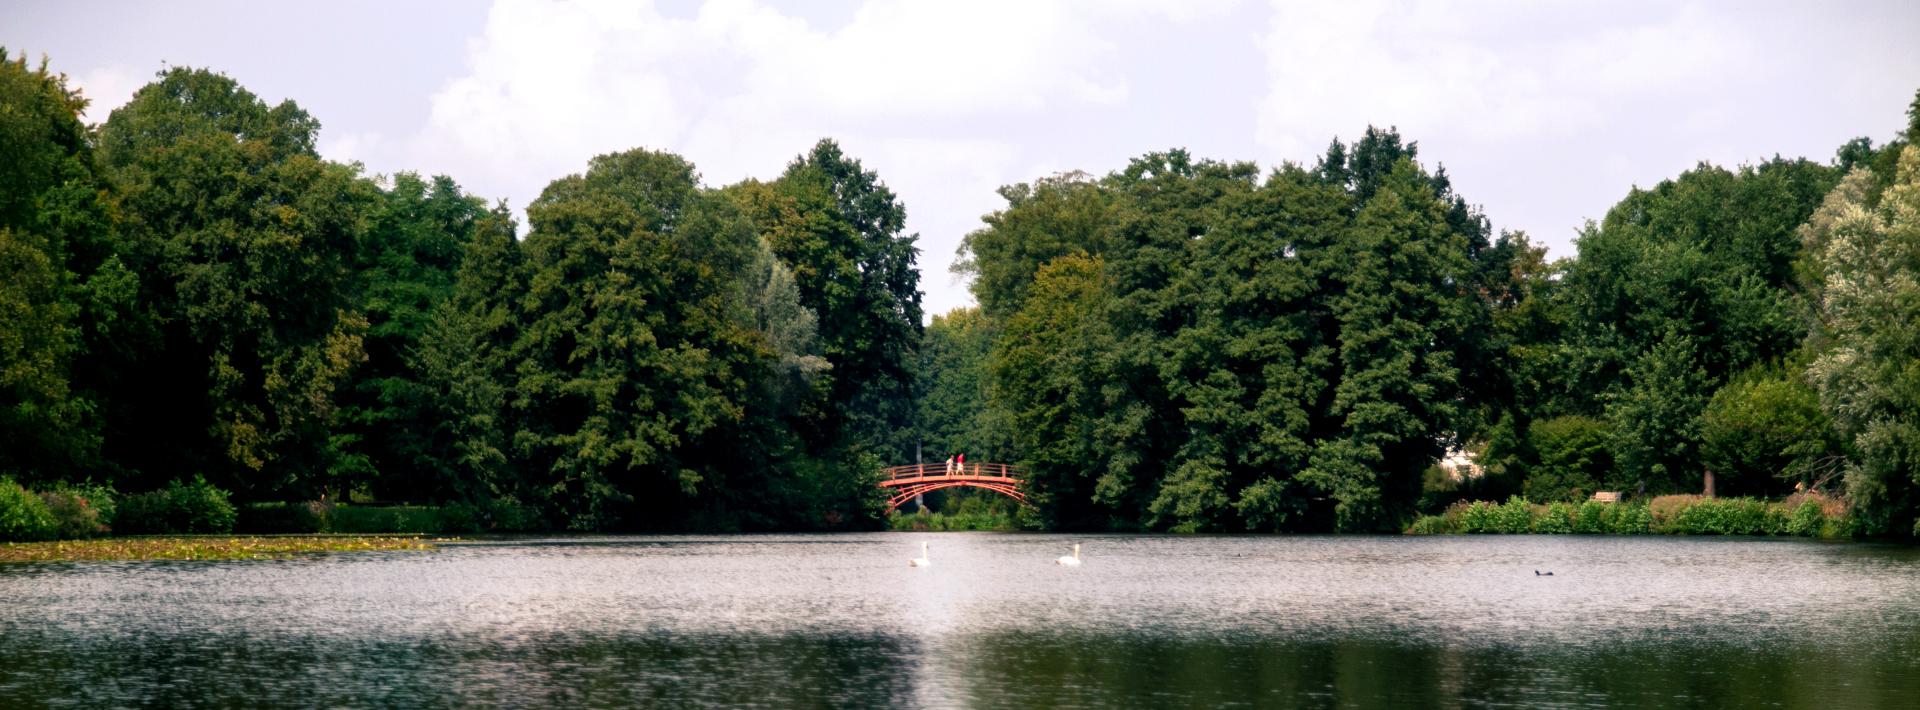 Château de Charlottenburg - Panorama